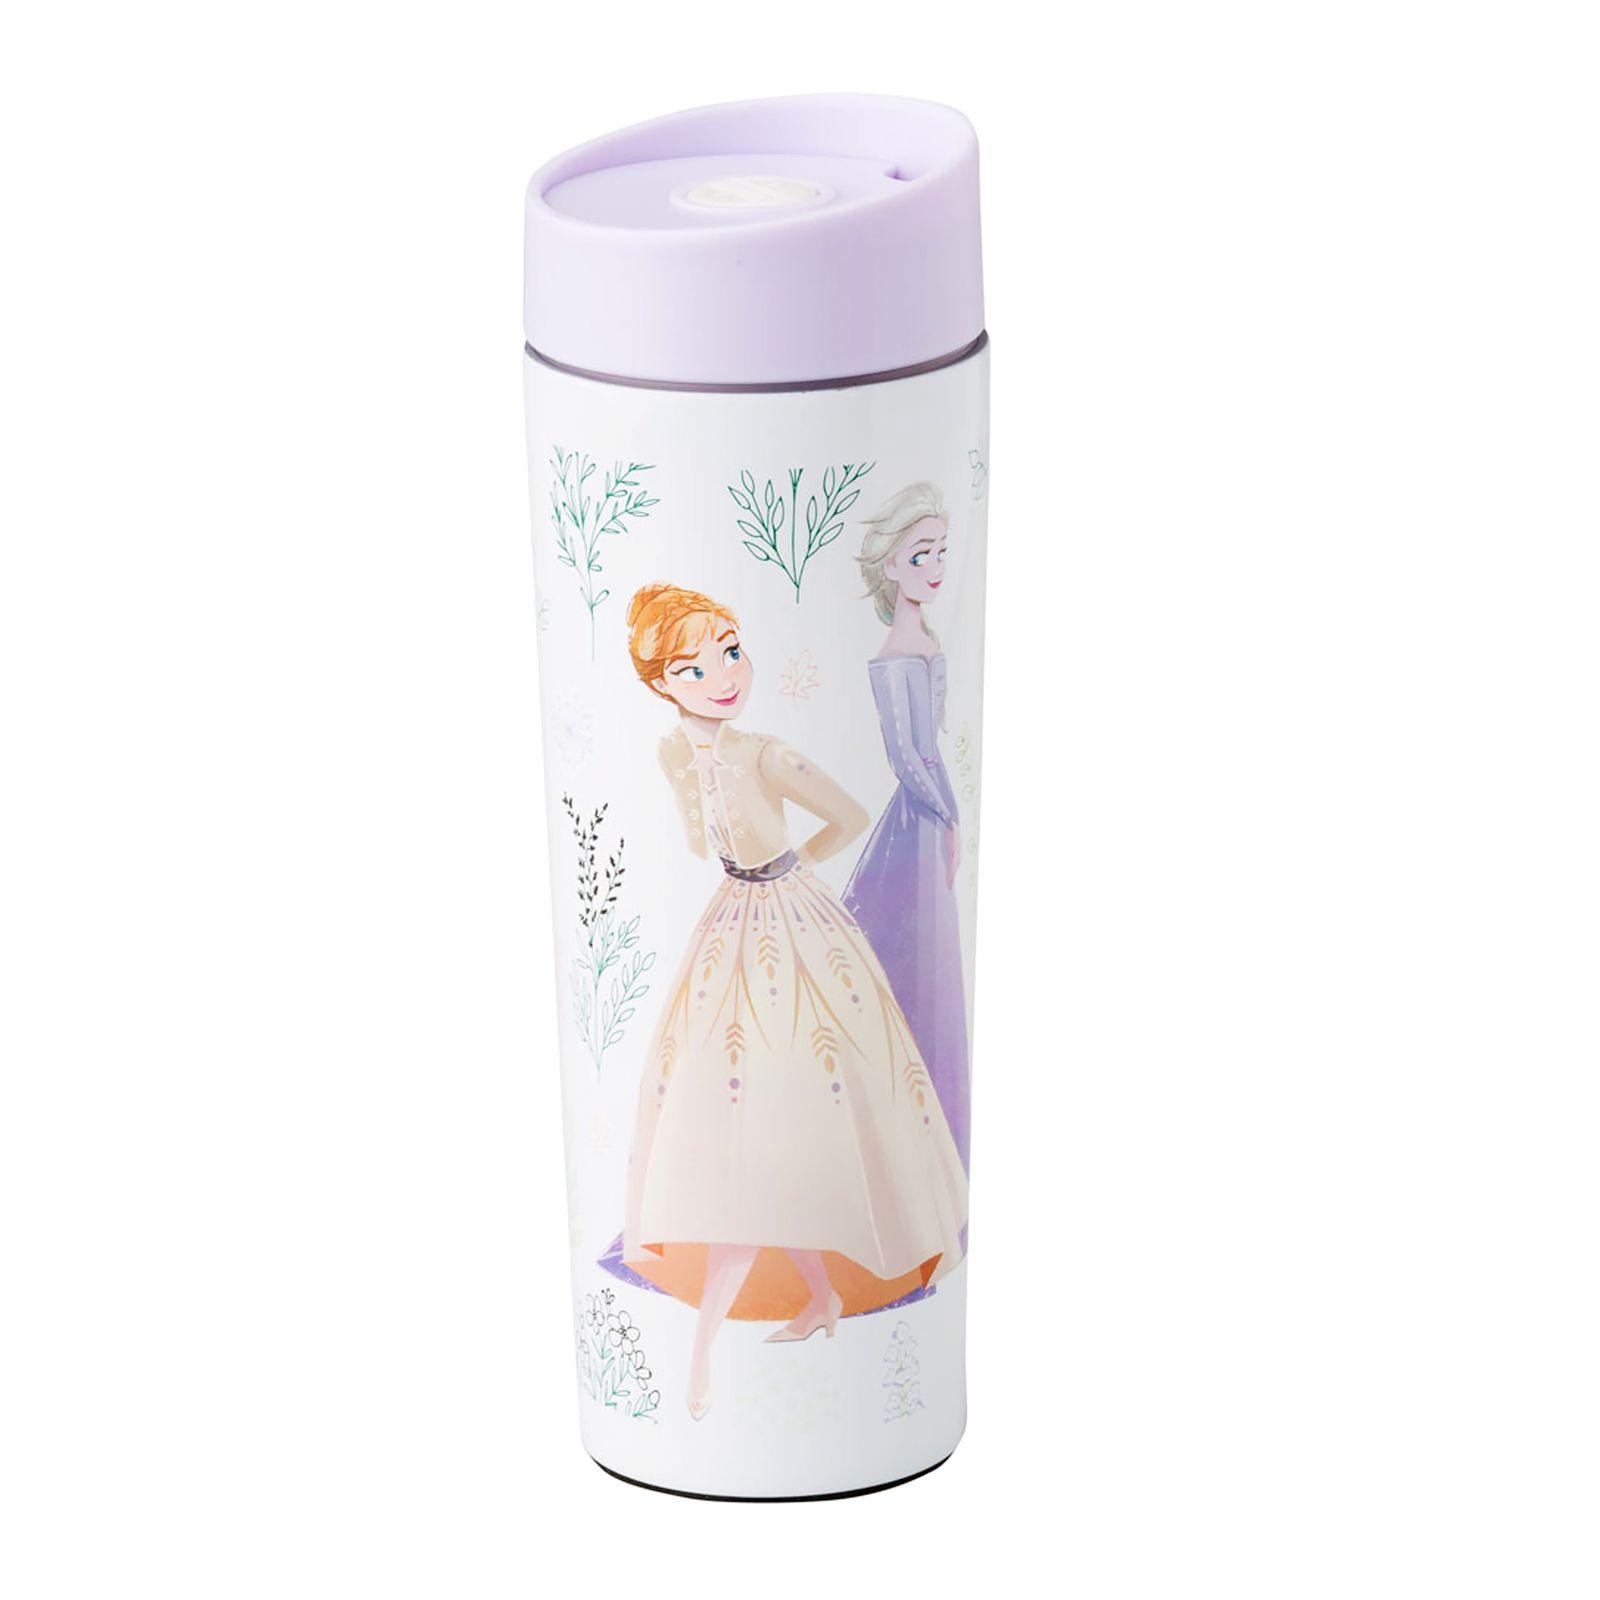 Thermal mug Frozen II Herbal 400 ml DISNEY